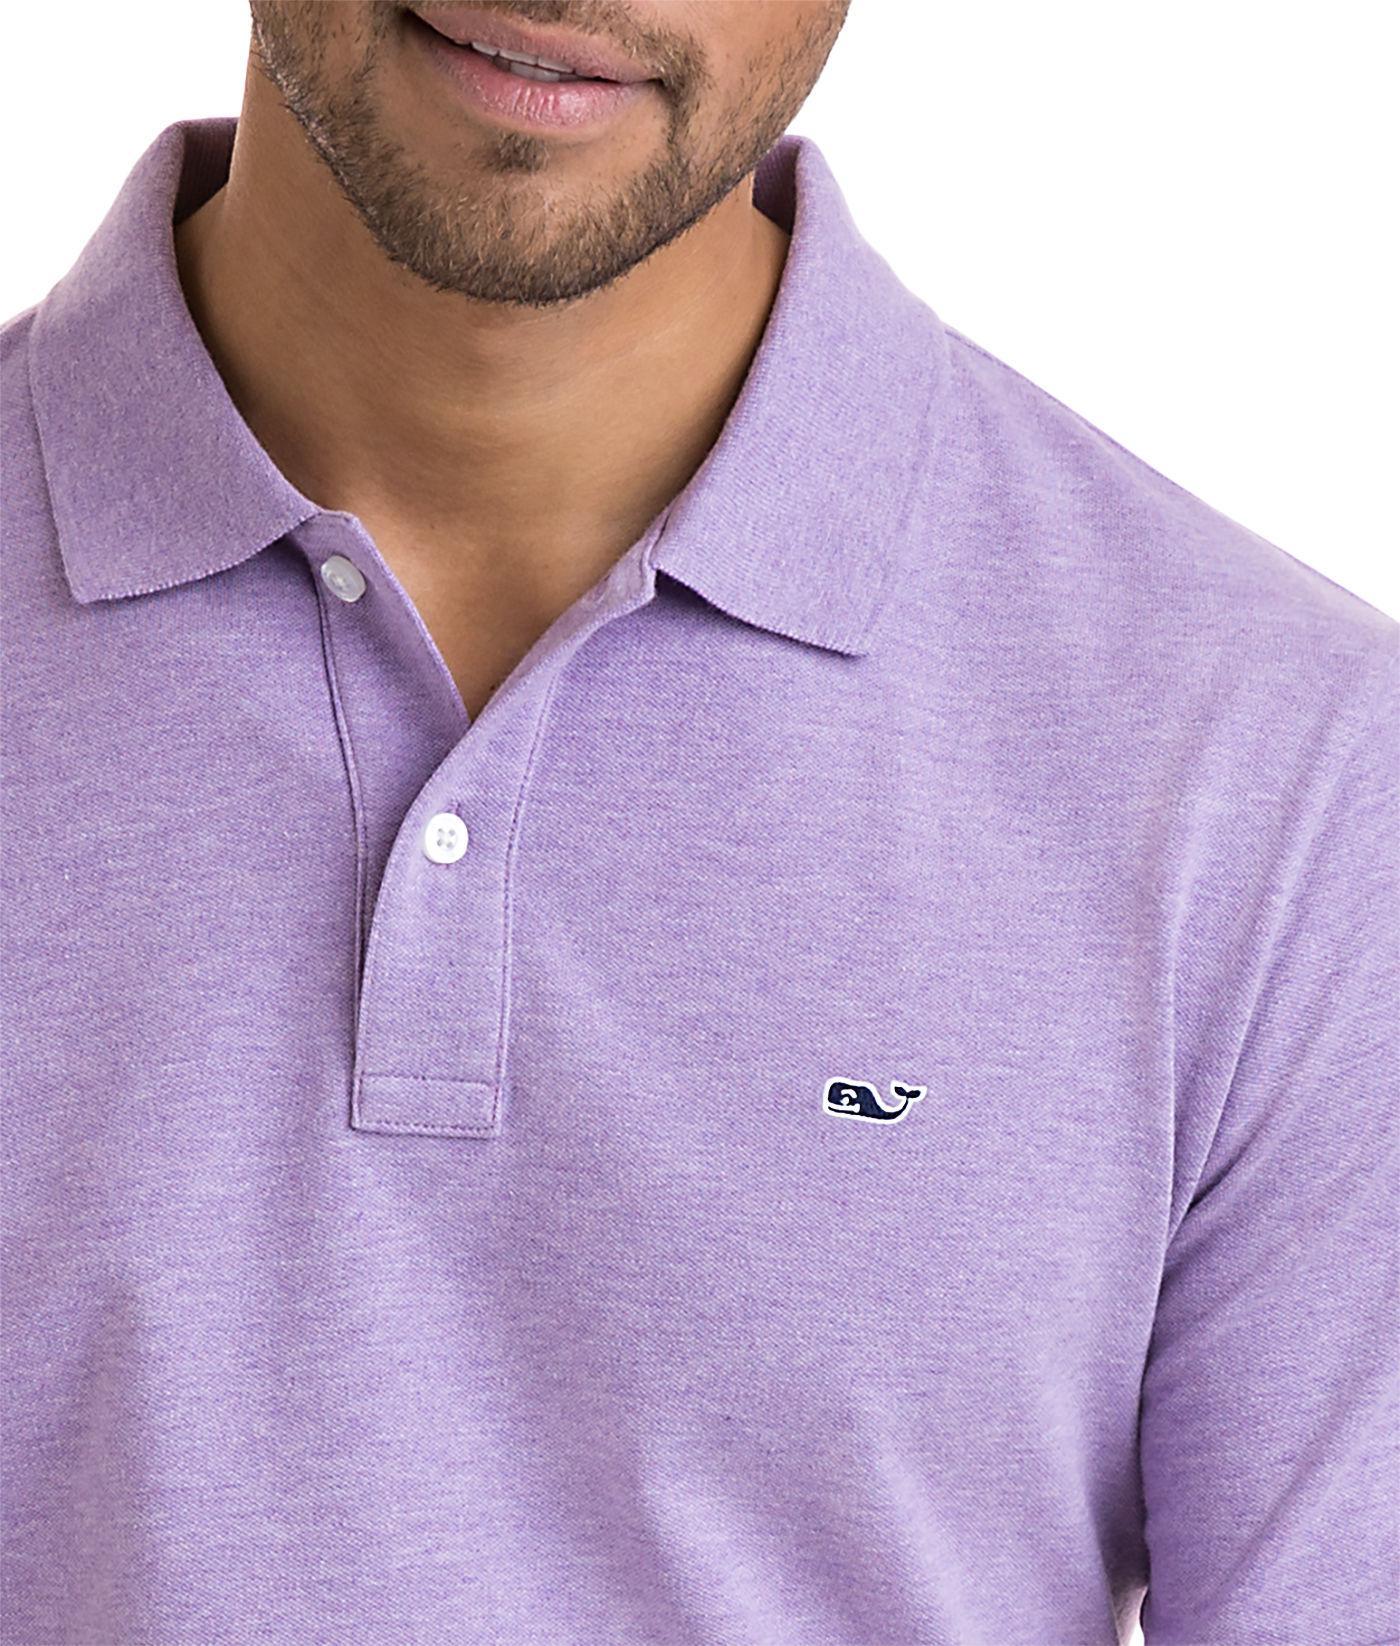 Vineyard Vines - Purple Stretch Pique Heather Polo for Men - Lyst. View  fullscreen 87730f716